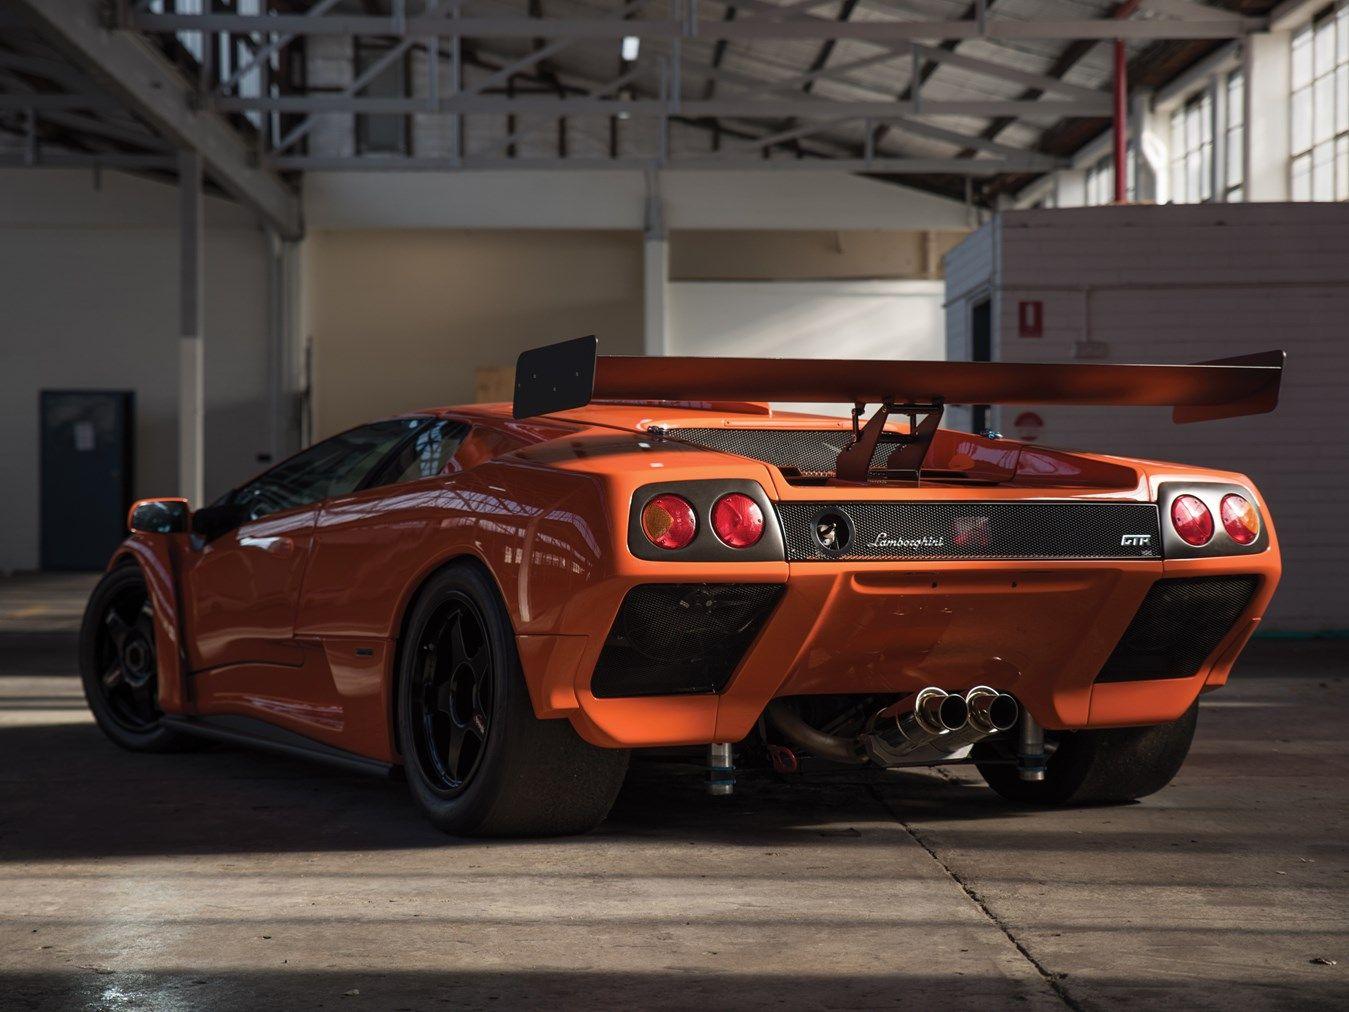 2000 Lamborghini Diablo Gtr Monterey 2017 Cars Lamborghini